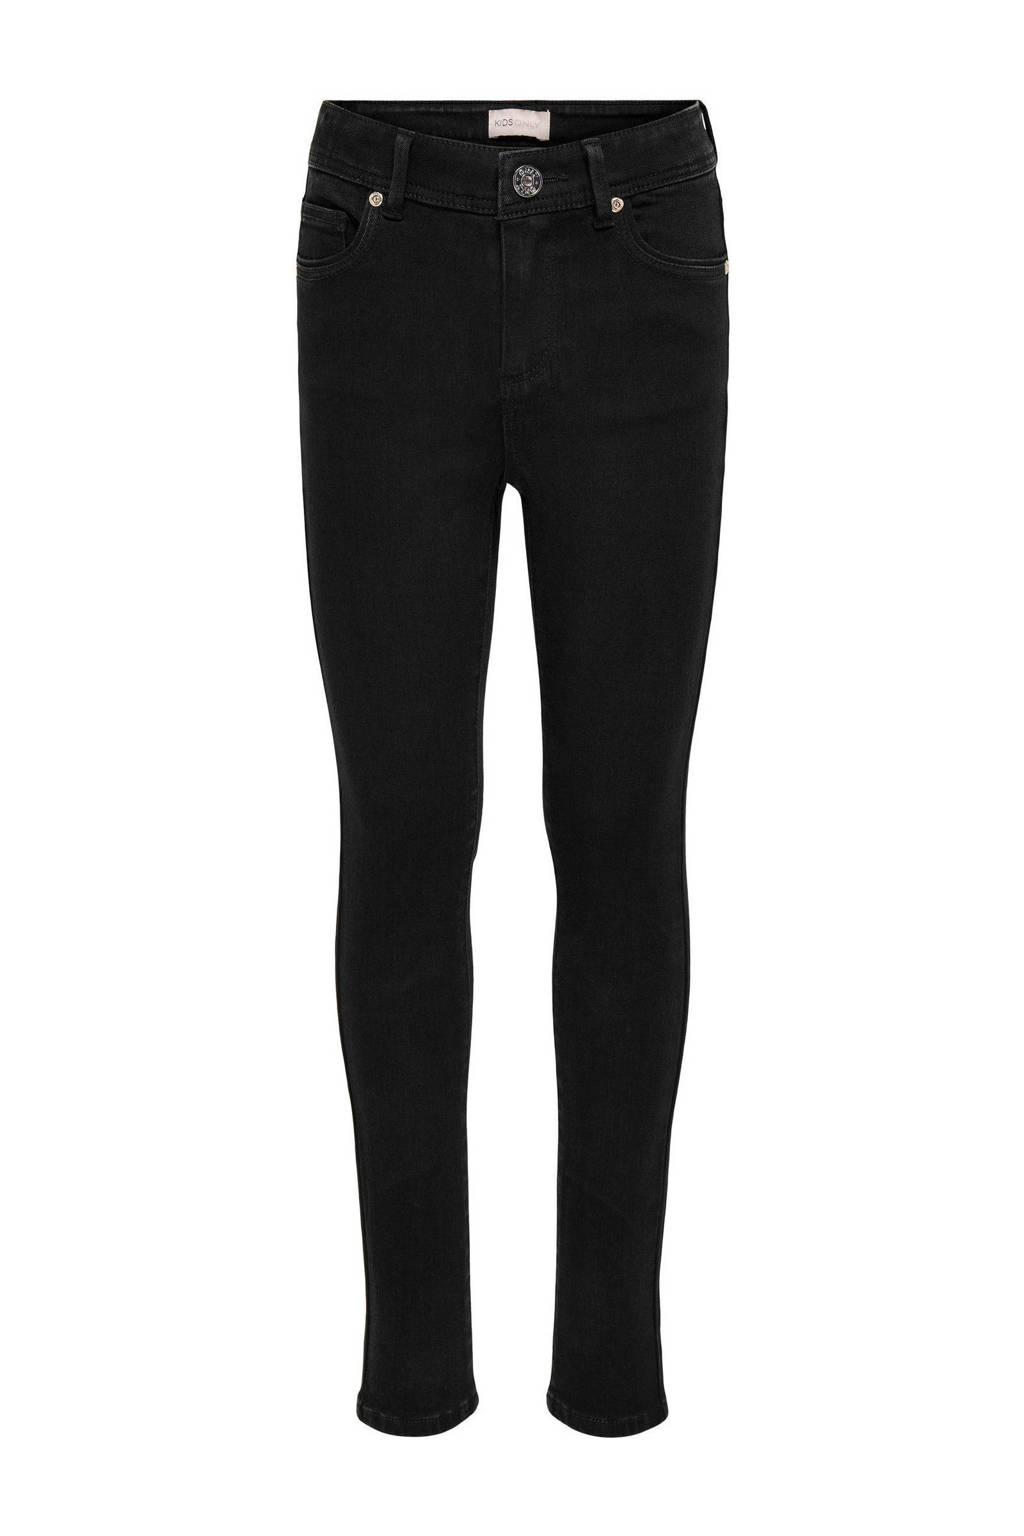 KIDS ONLY high waist skinny jeans KONWAUW zwart, Zwart